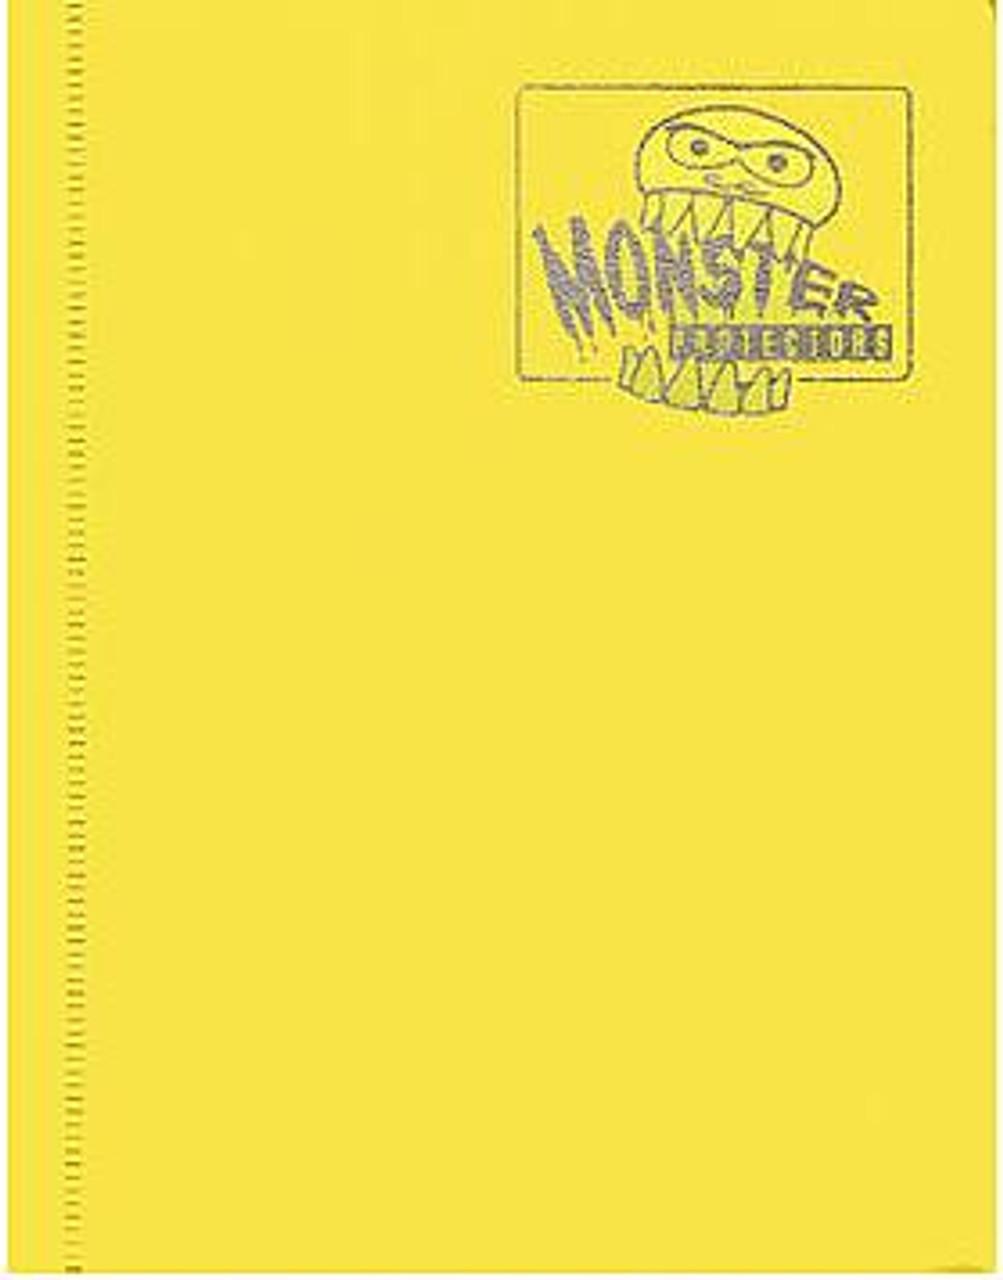 Card Supplies Yellow 4-Pocket Binder